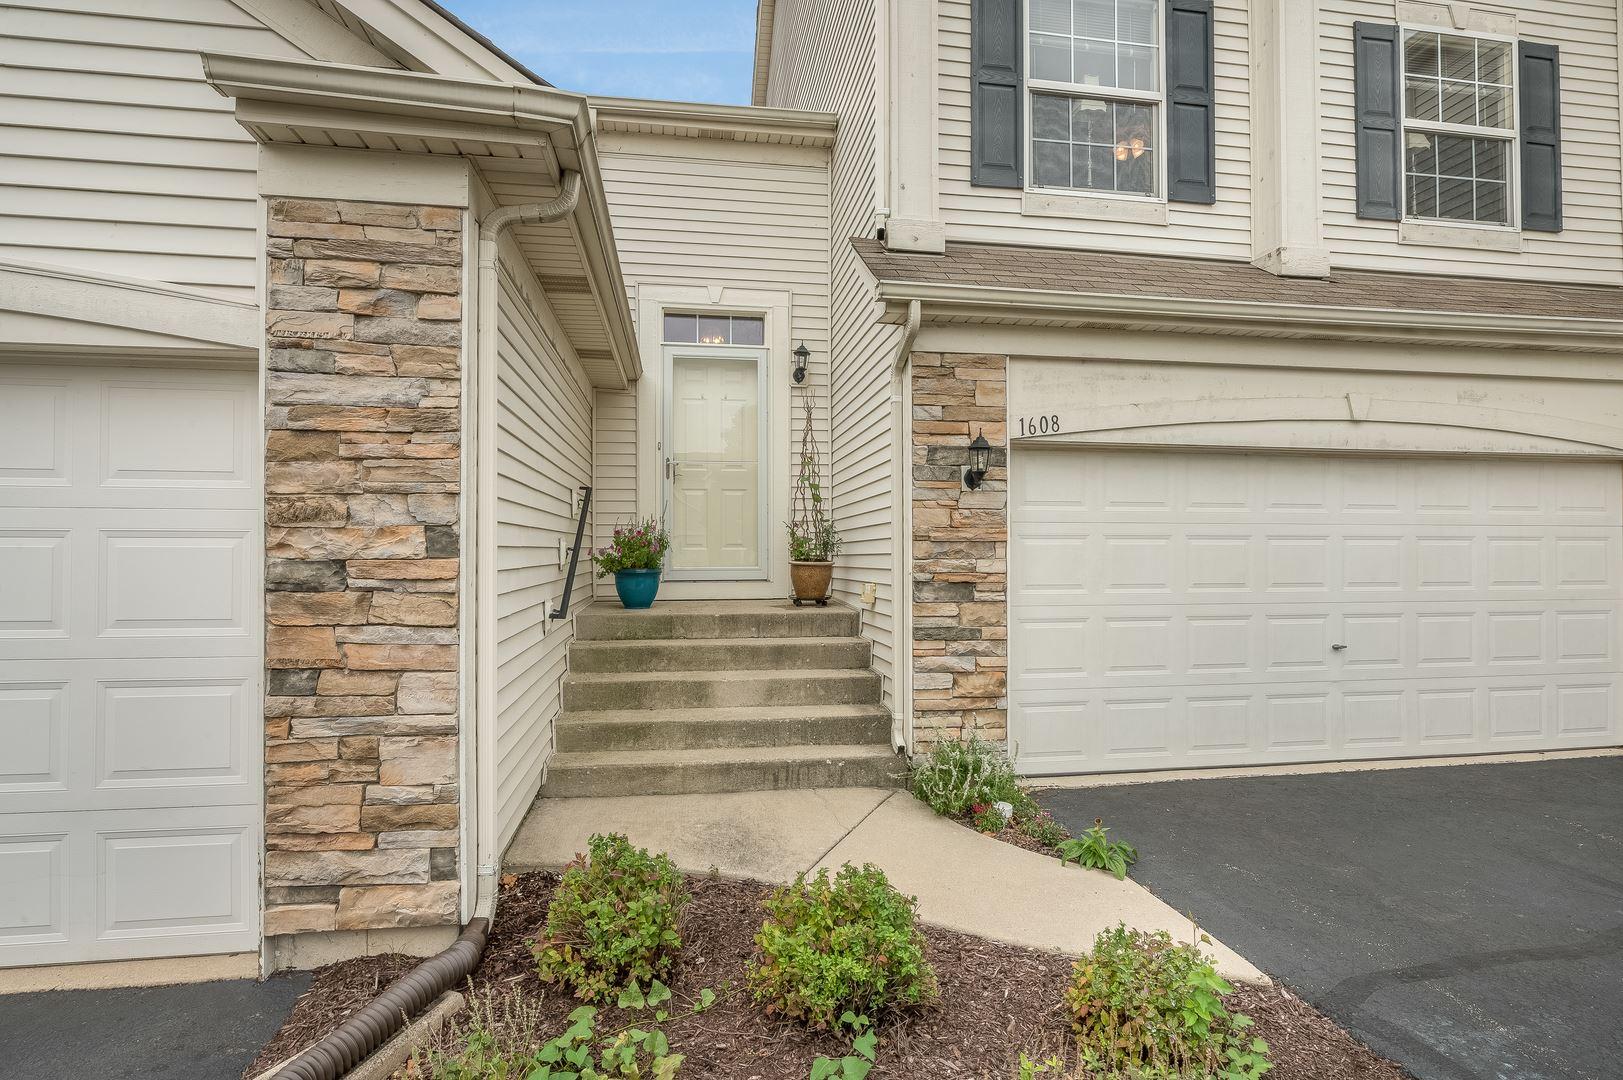 Photo of 1608 S Fieldstone Drive, Shorewood, IL 60404 (MLS # 10855229)